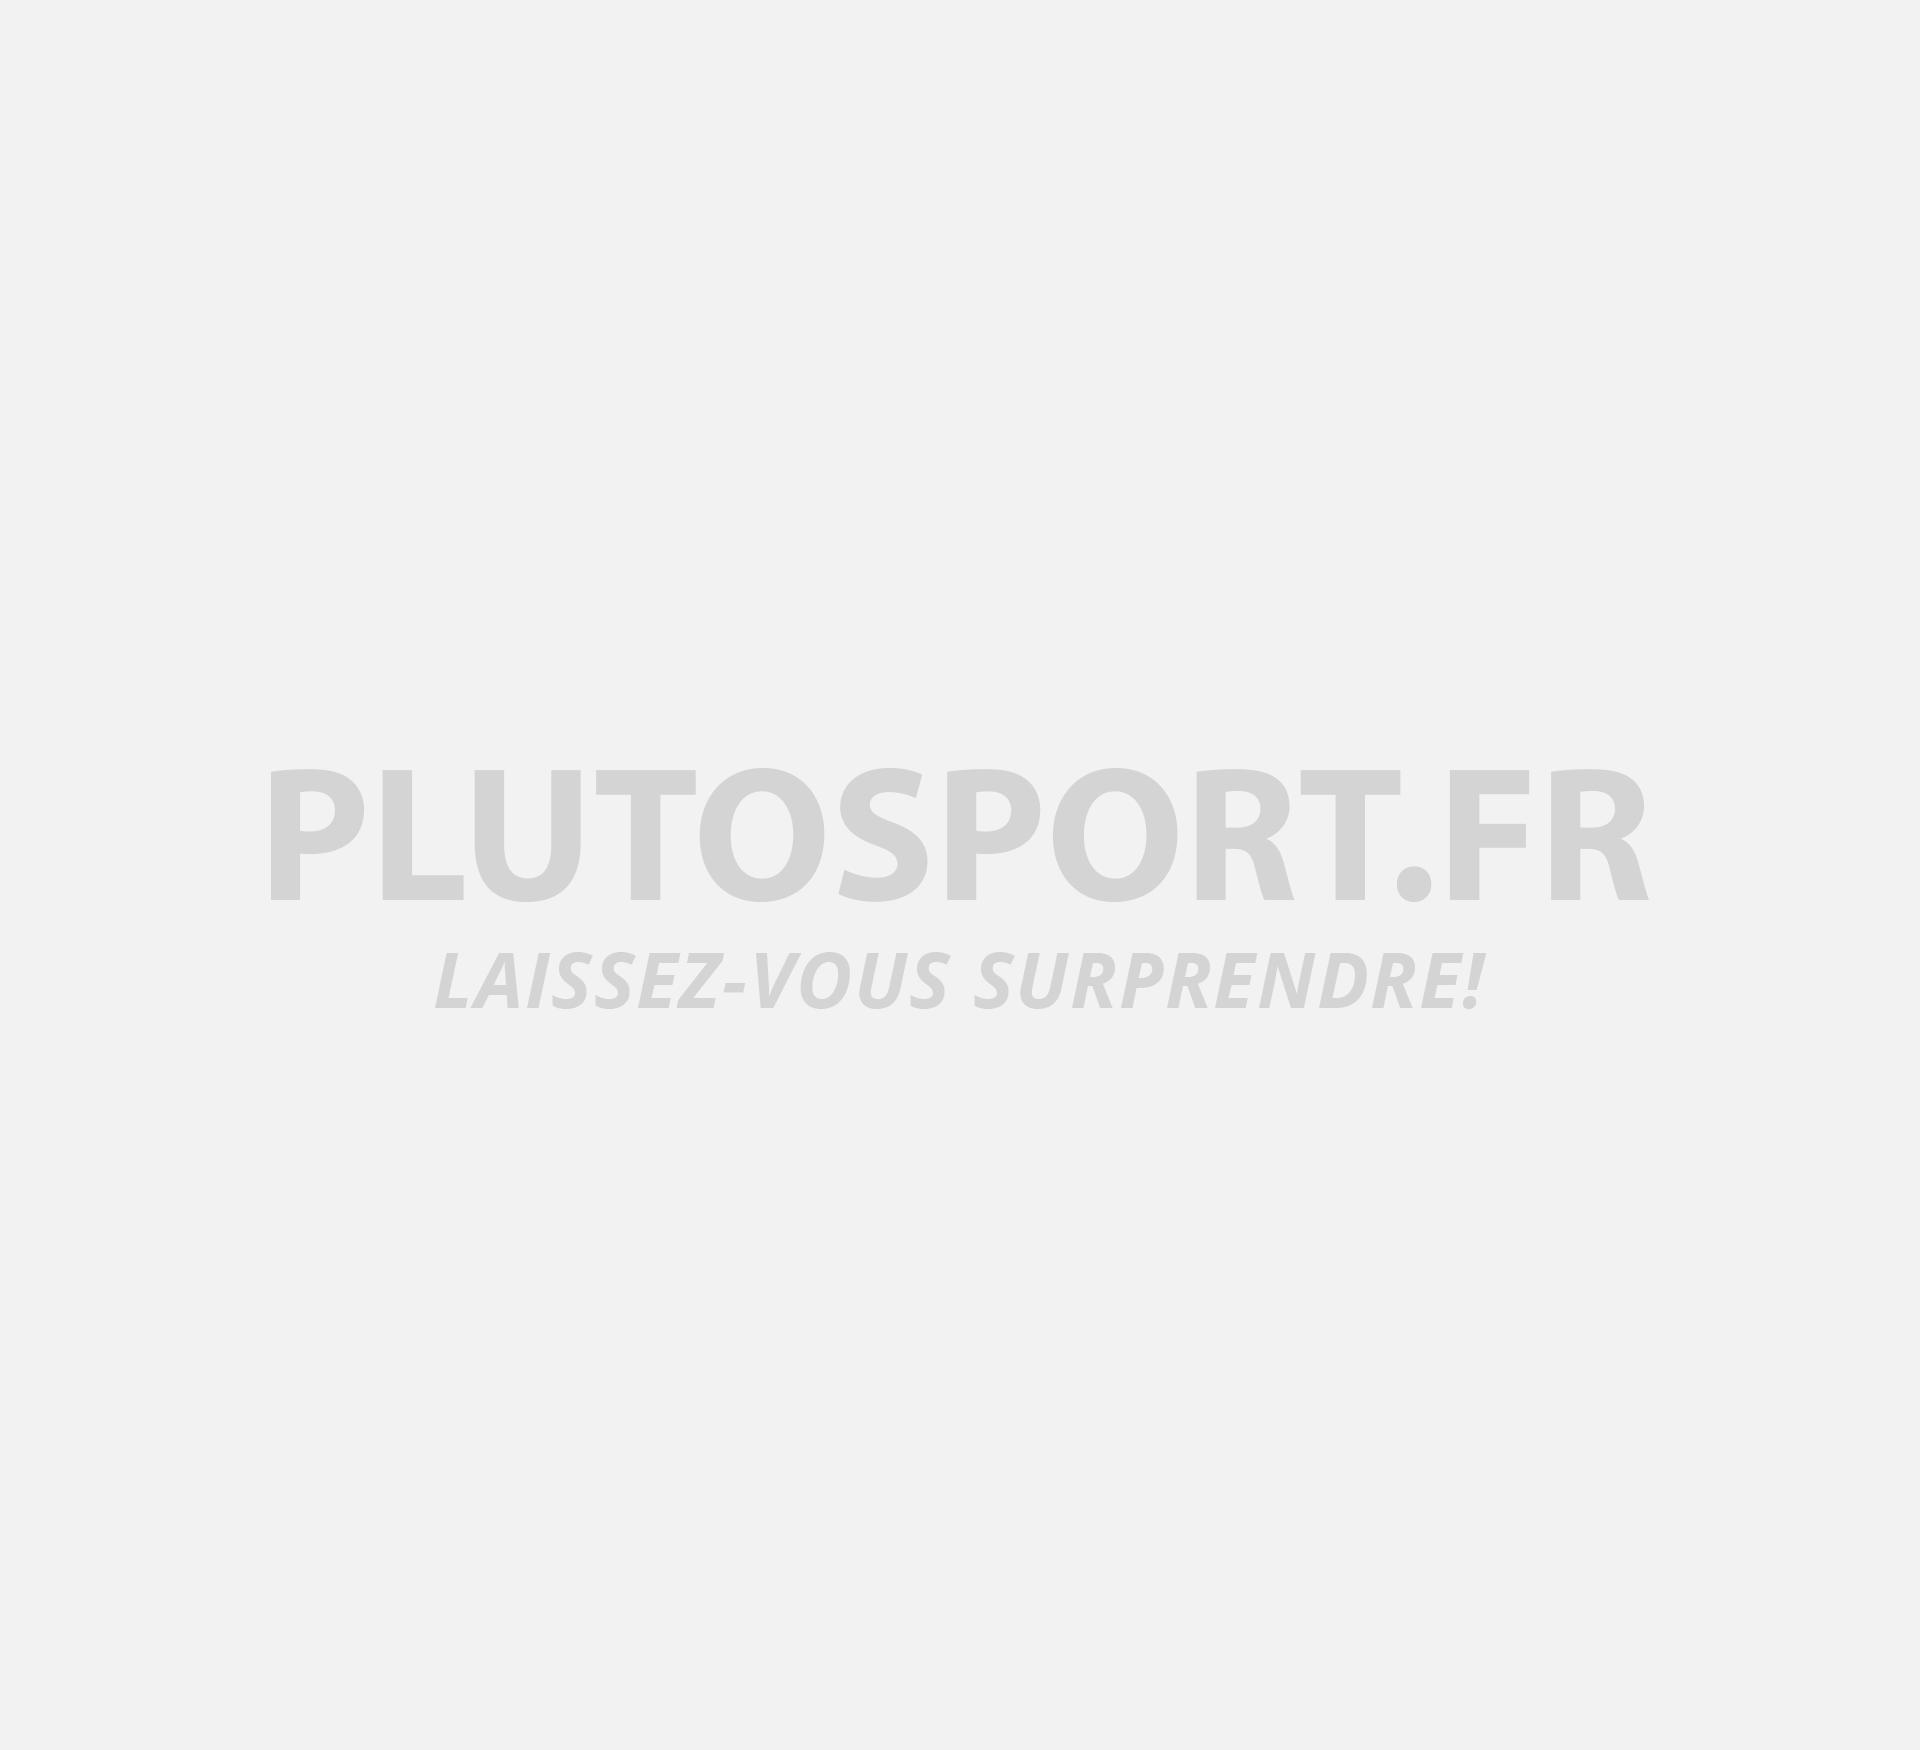 Cuissard de cyclisme Löffler Bib Homme